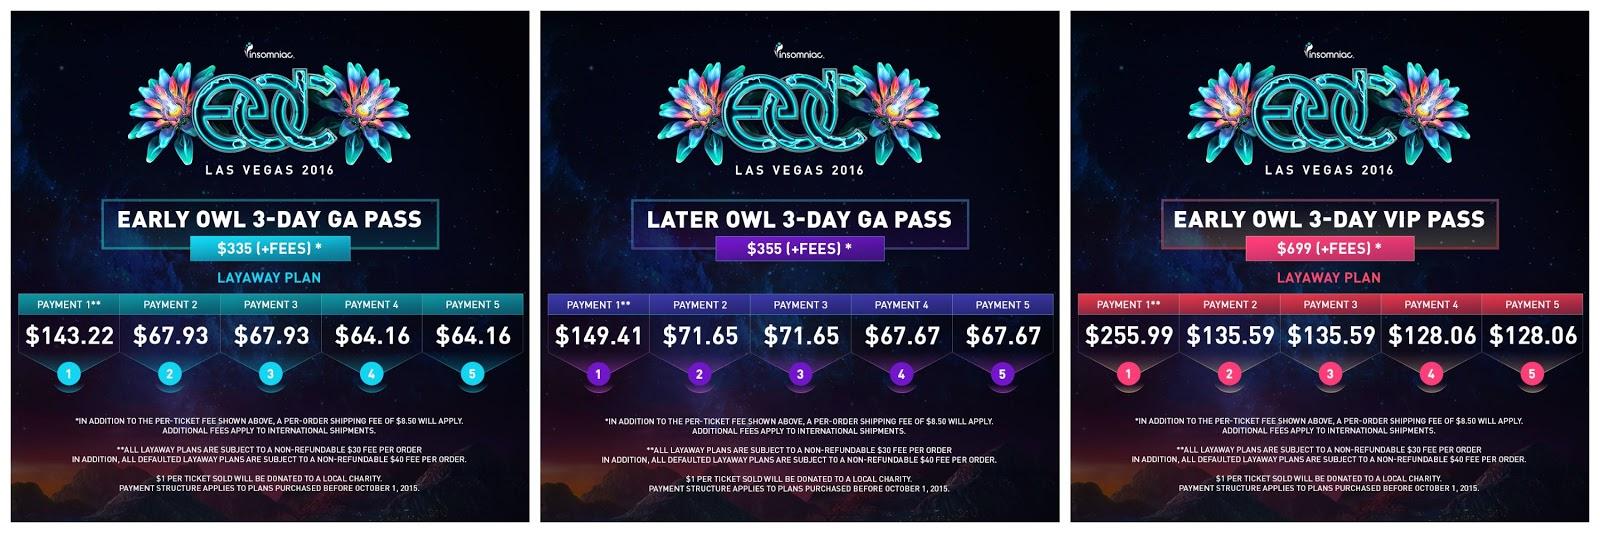 EDC Las Vegas Payment Plans What YOU Need To Know GDE - Edc las vegas map 2016